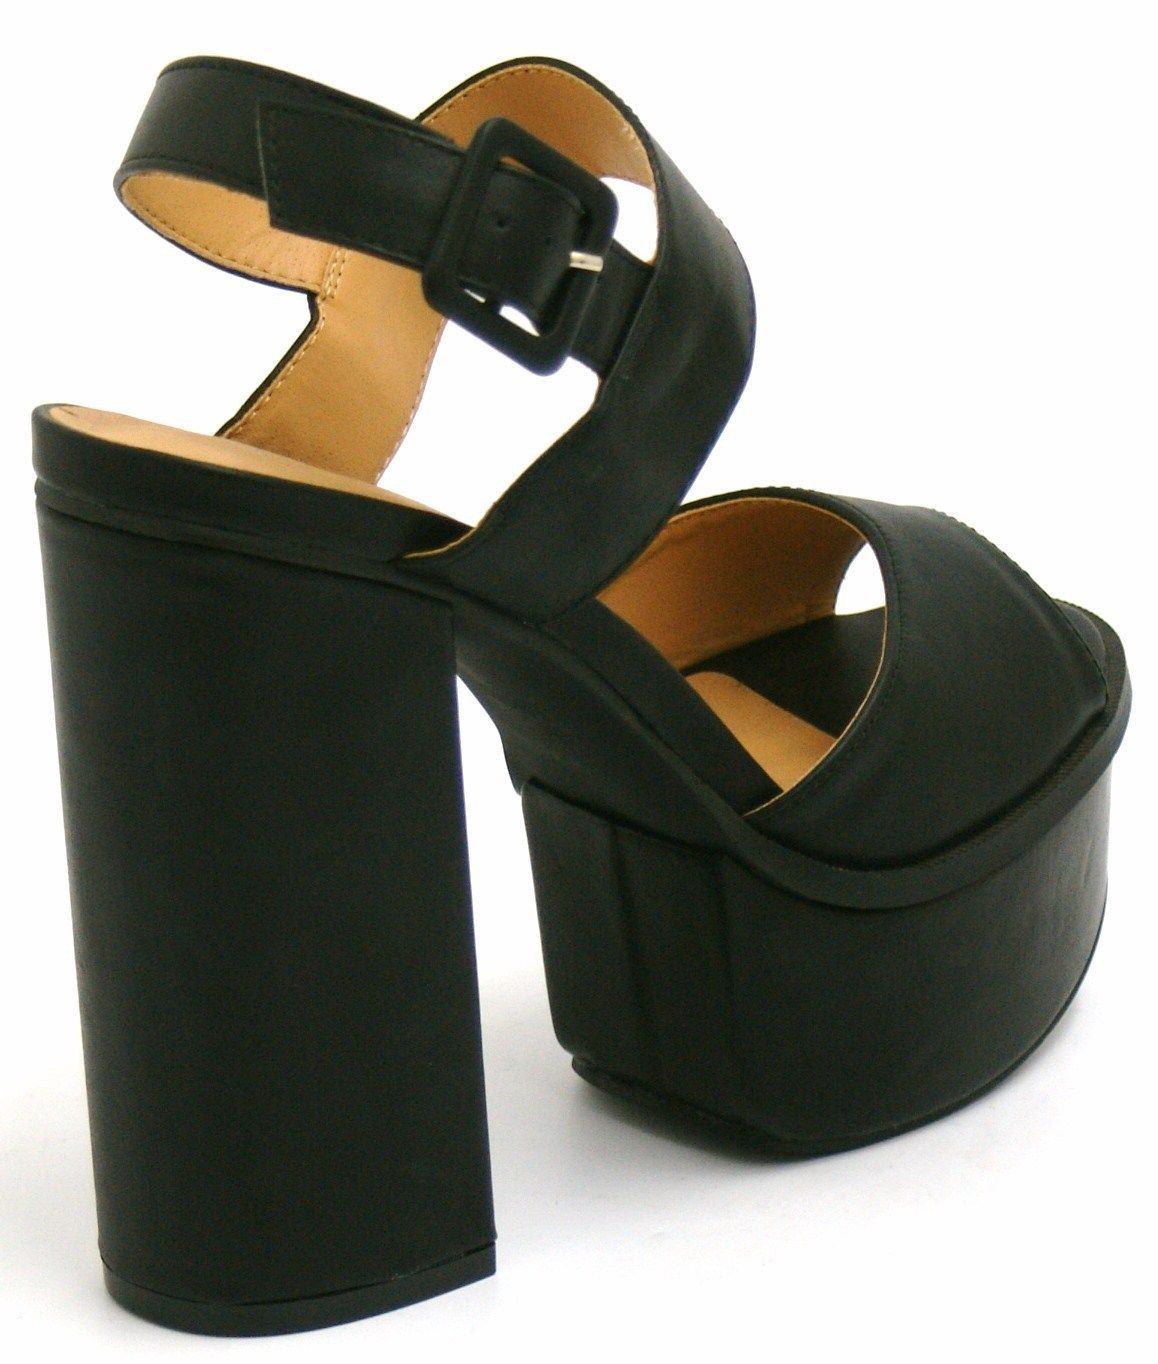 Ladies High Heel shoes - Sexy High Heels FrizeMedia